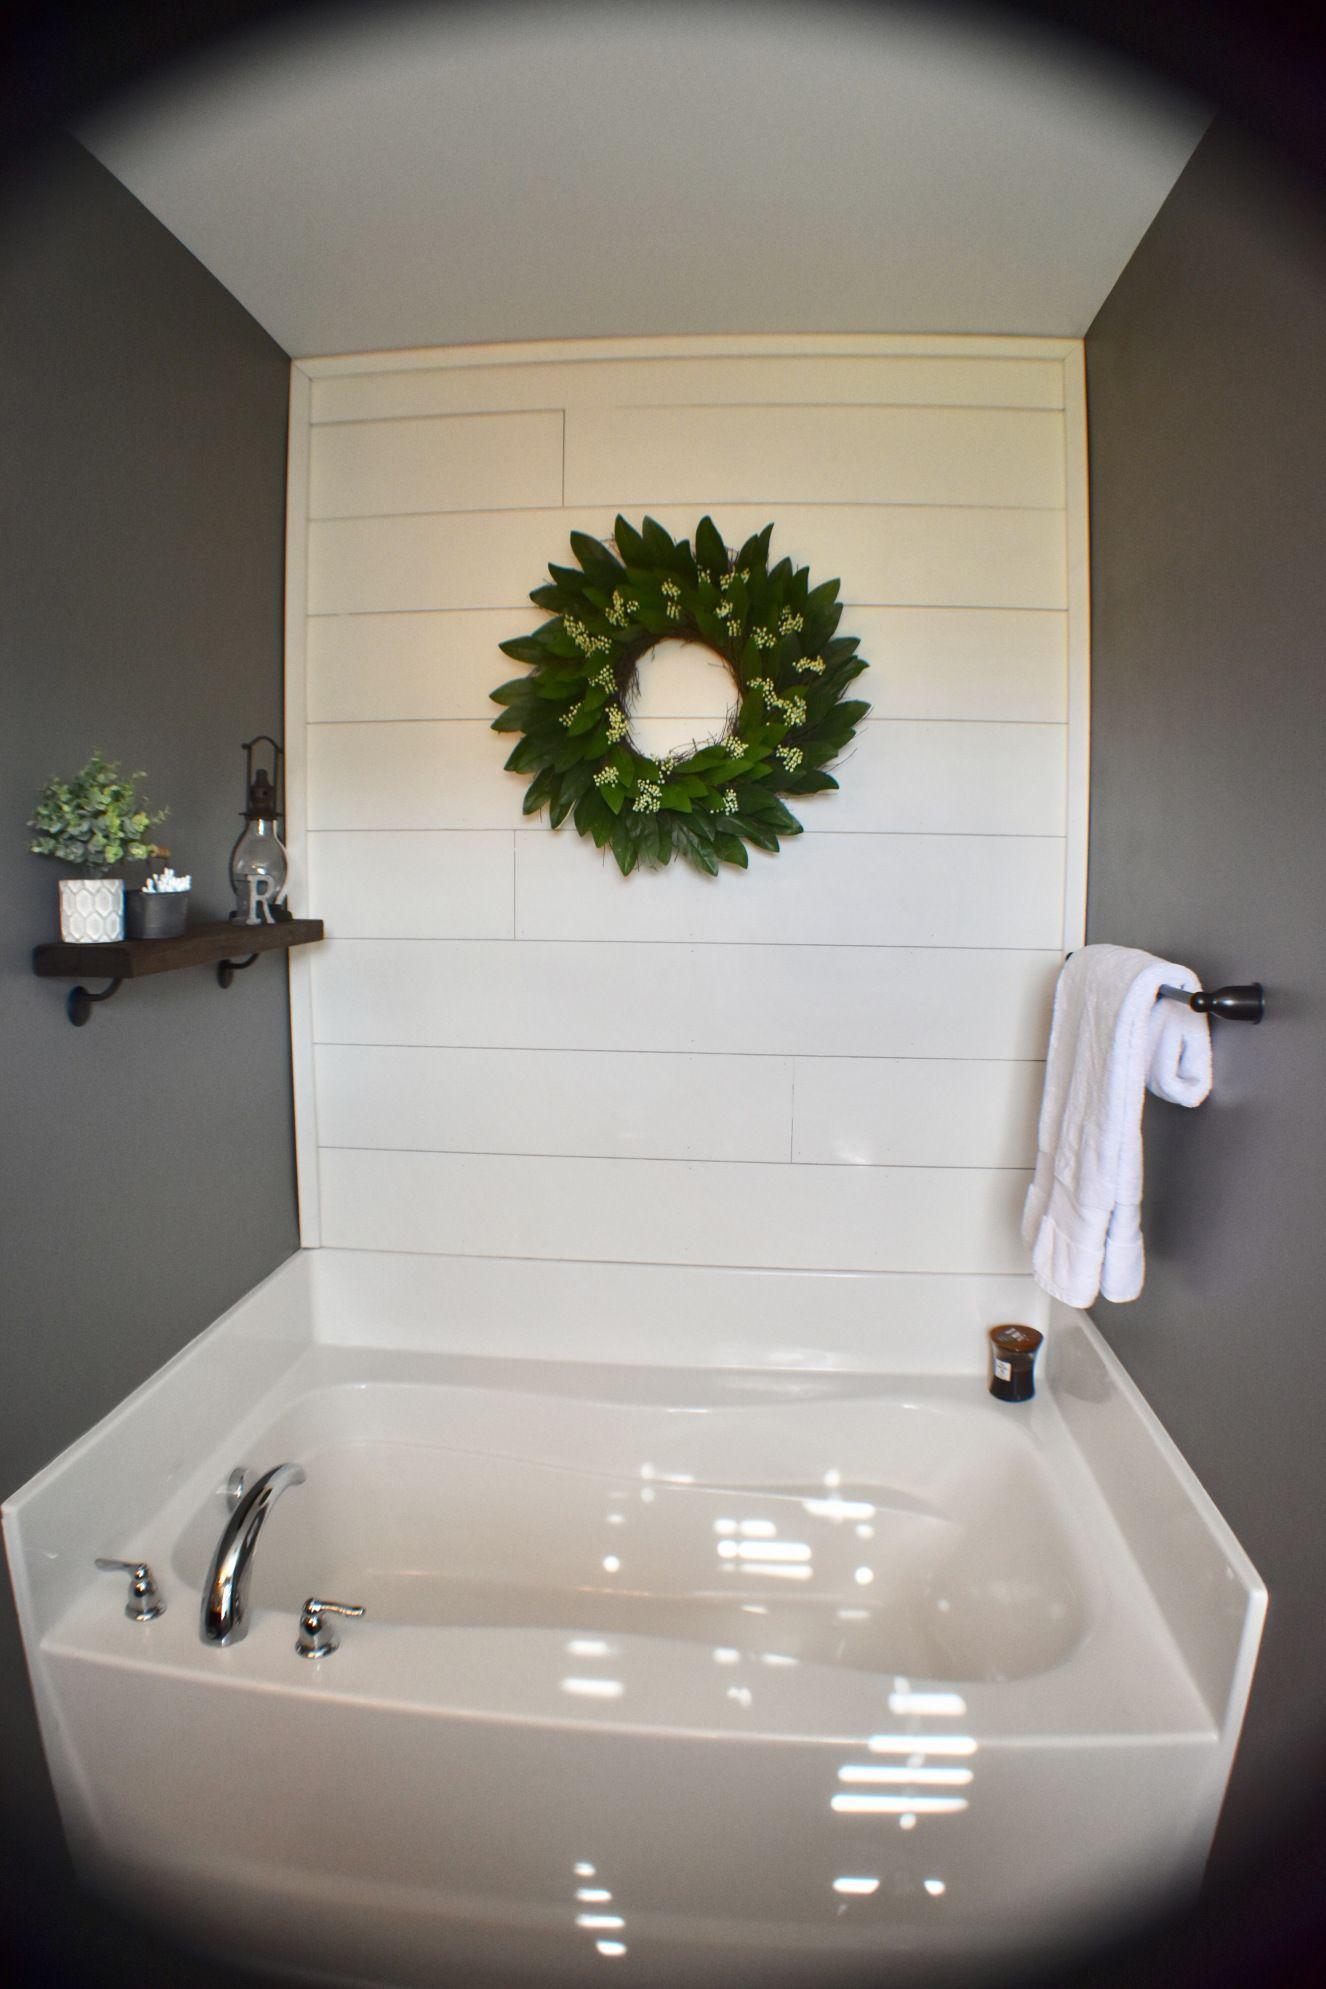 Shiplap over bathtub | DIY and home decorating ideas | Pinterest ...